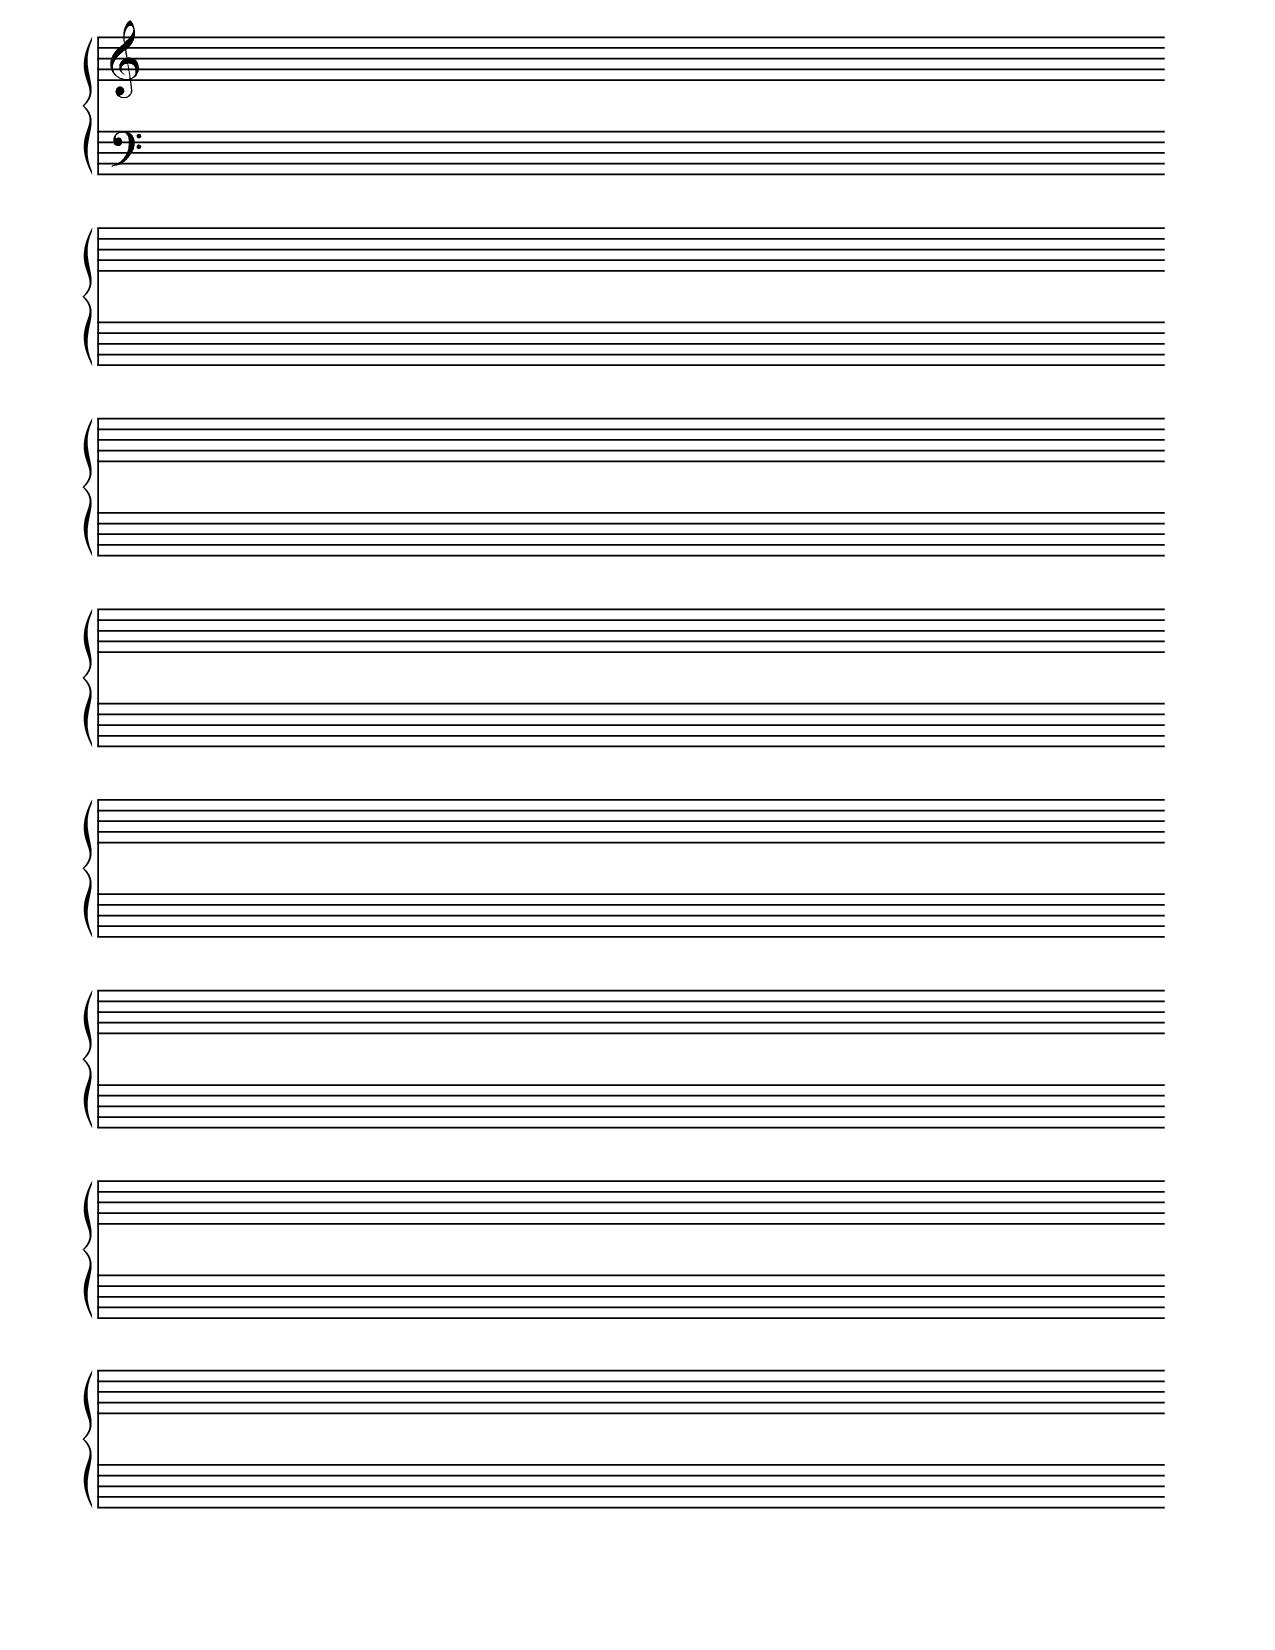 Printable+Blank+Piano+Sheet+Music+Paper | Sheet Music In 2019 - Free Printable Blank Music Staff Paper